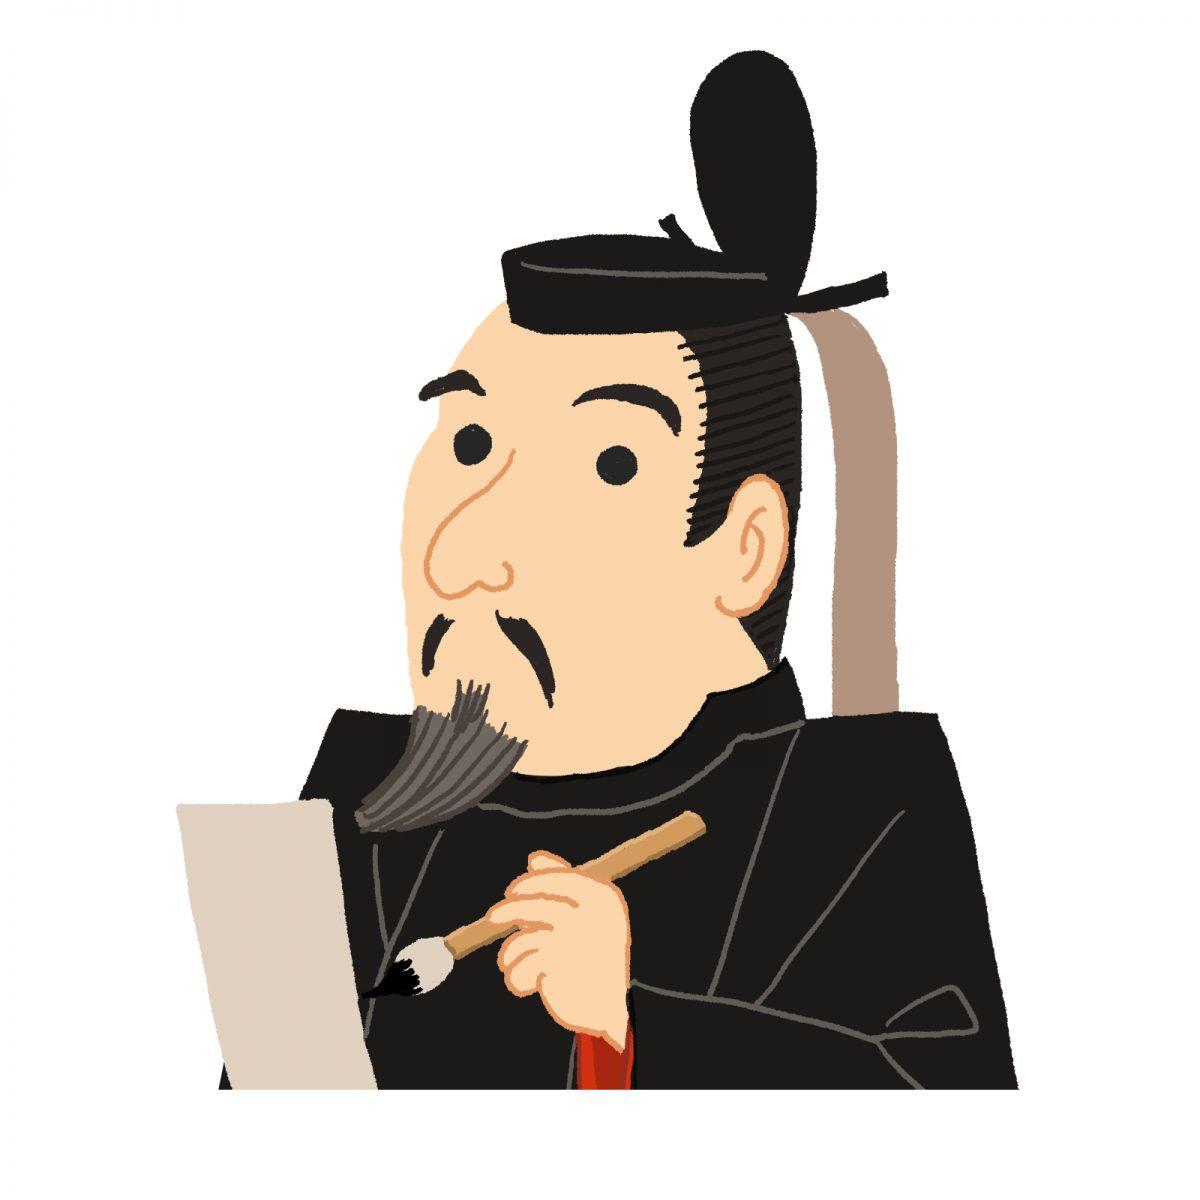 日本古来の歌 職場の教養2019.8.19(木)感想